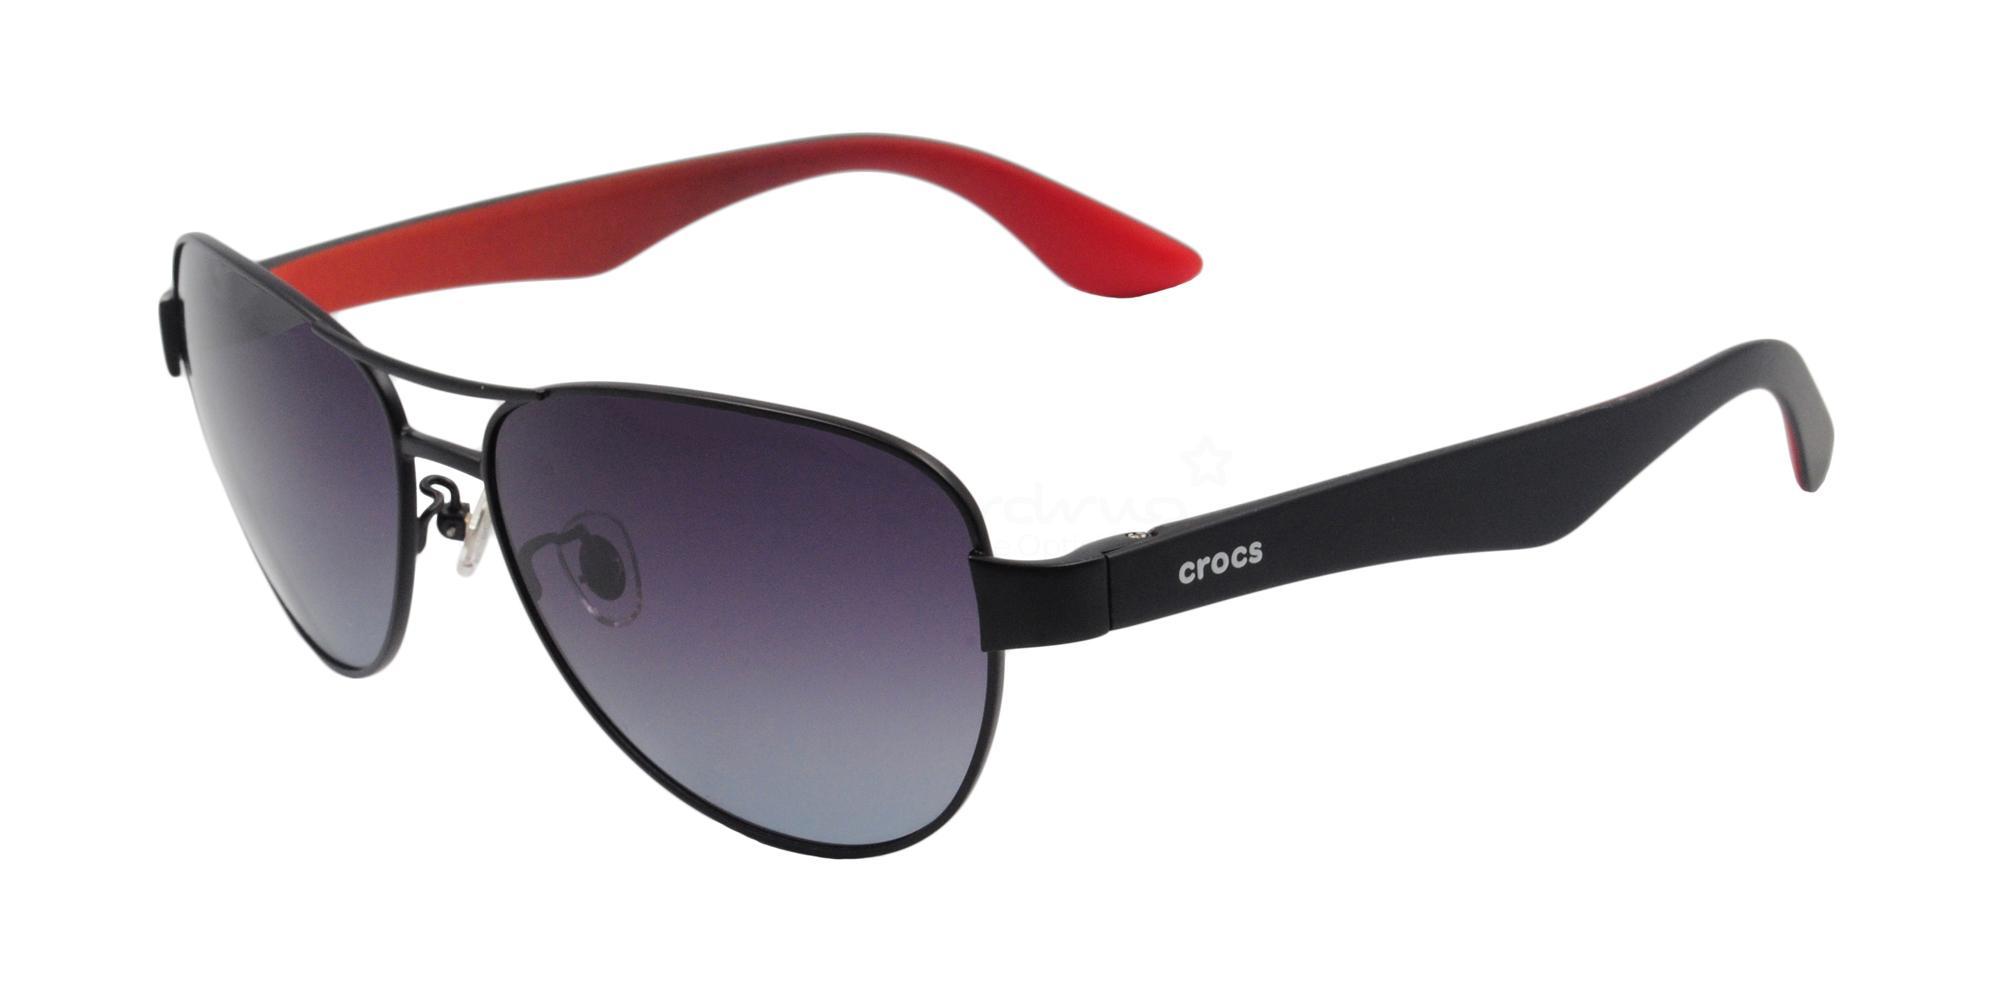 20BK CS4111 Sunglasses, Crocs Eyewear